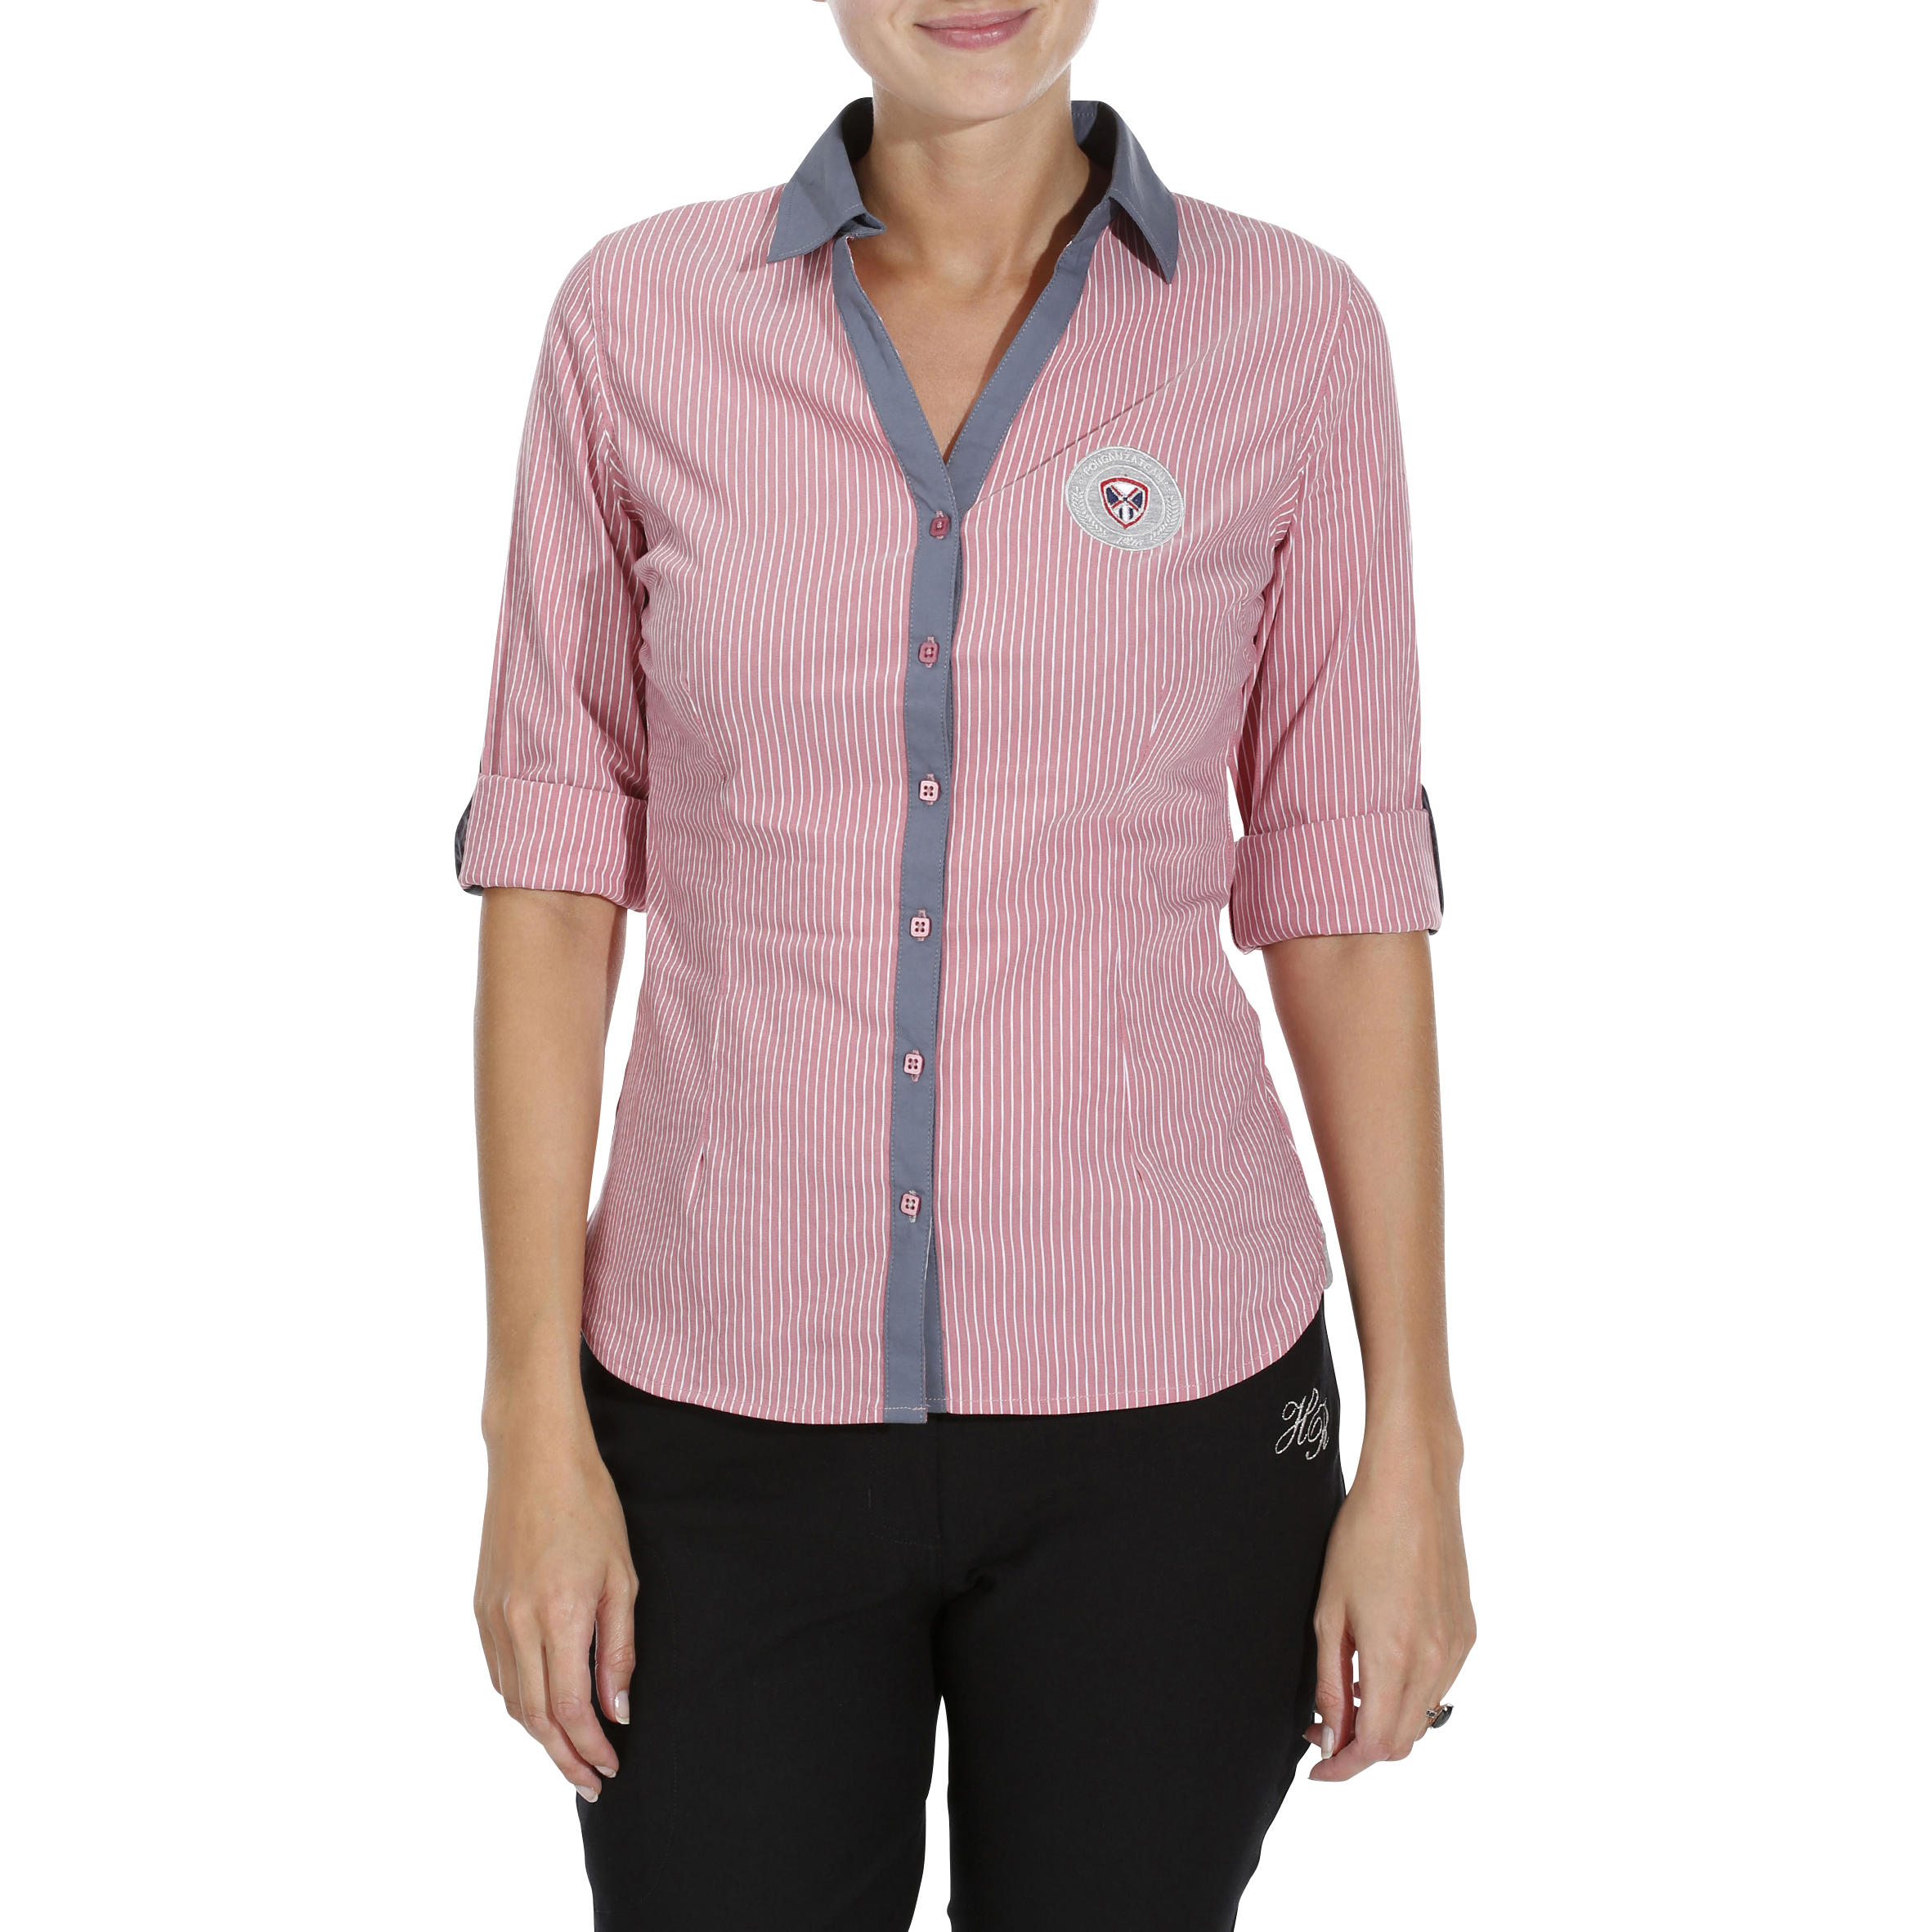 Okkso sarl Damesblouse Performer ruitersport gestreept roze/grijs